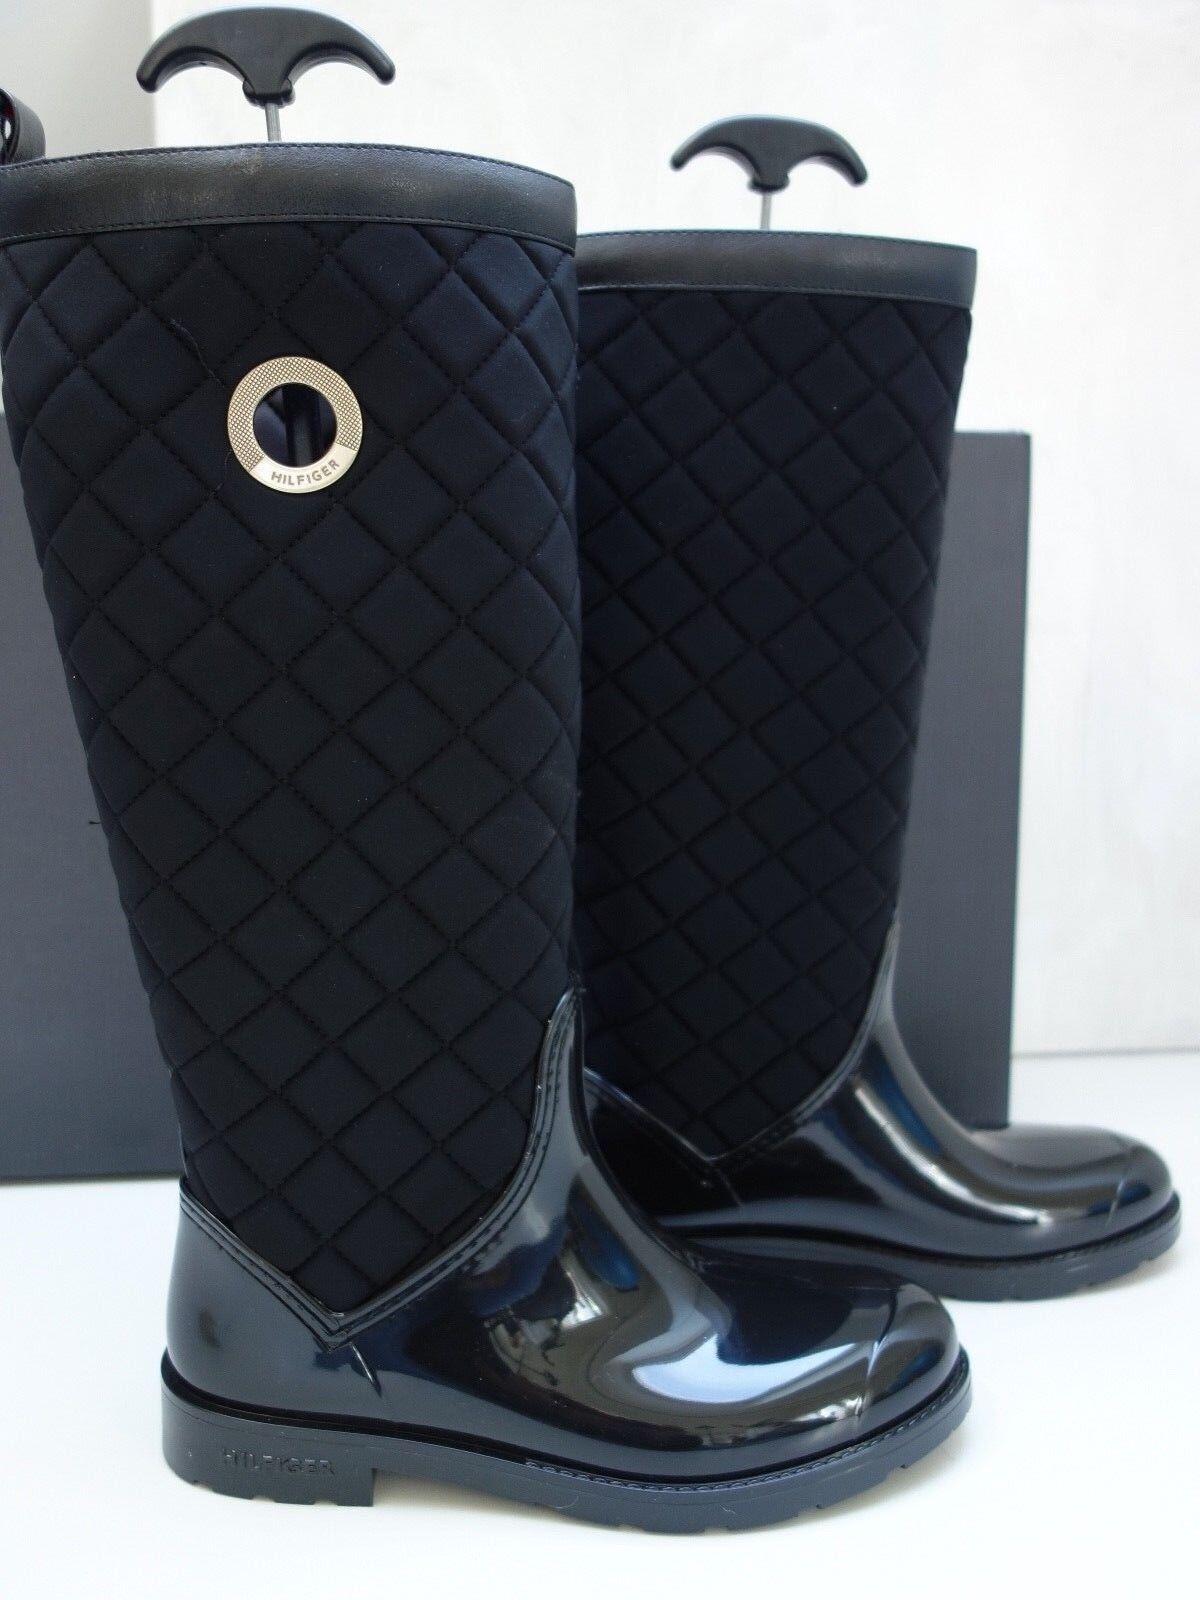 Moderna tommy hilfiger botas de goma negro nuevo